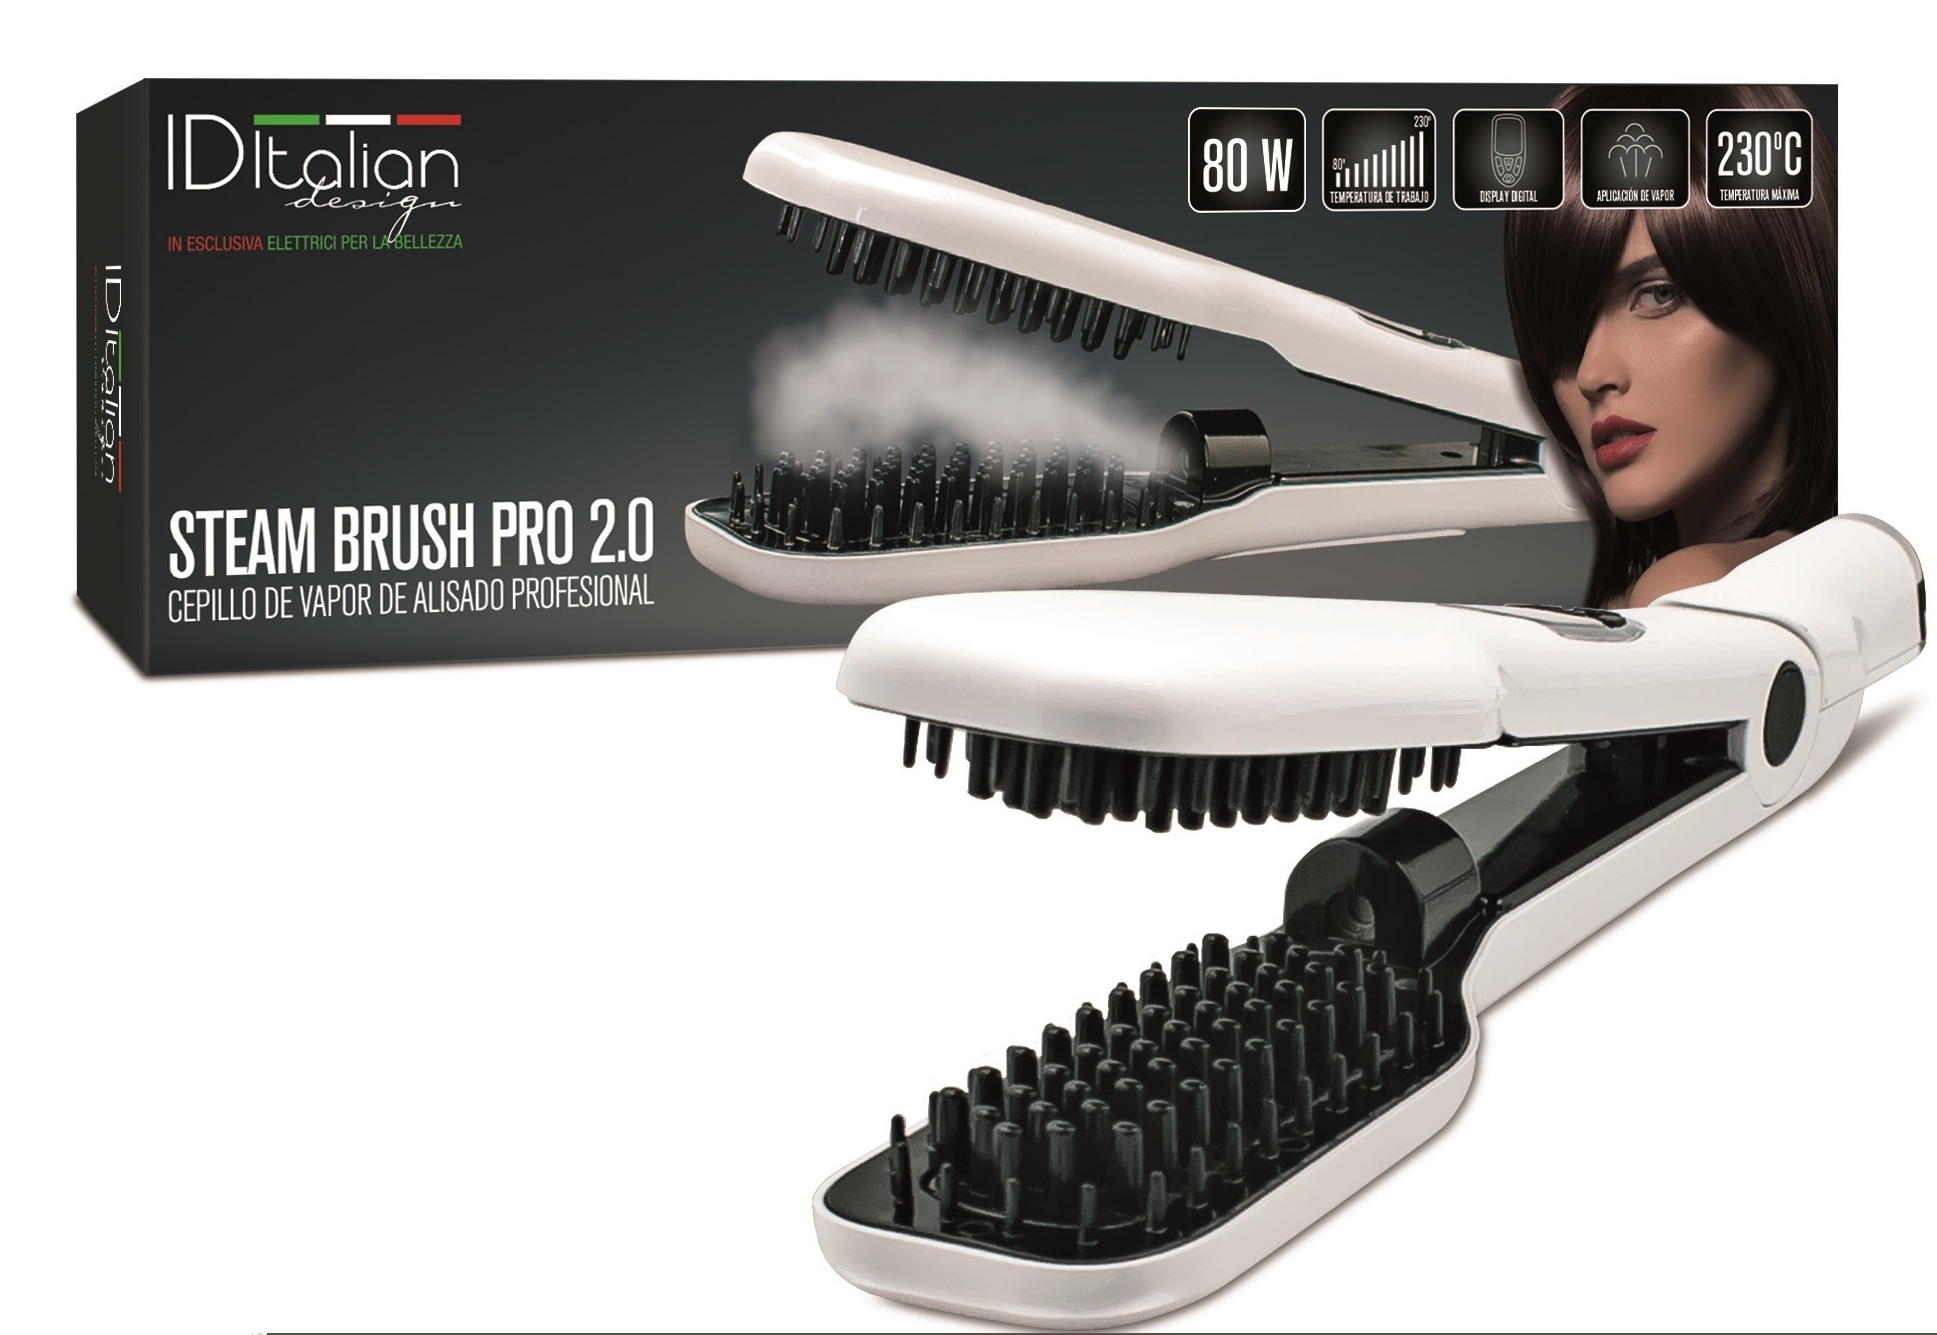 ea04bc2fb Cepillo profesional Plancha de Pelo Alisado Plancha De Vapor IDItalian  Steam Brush 2.0